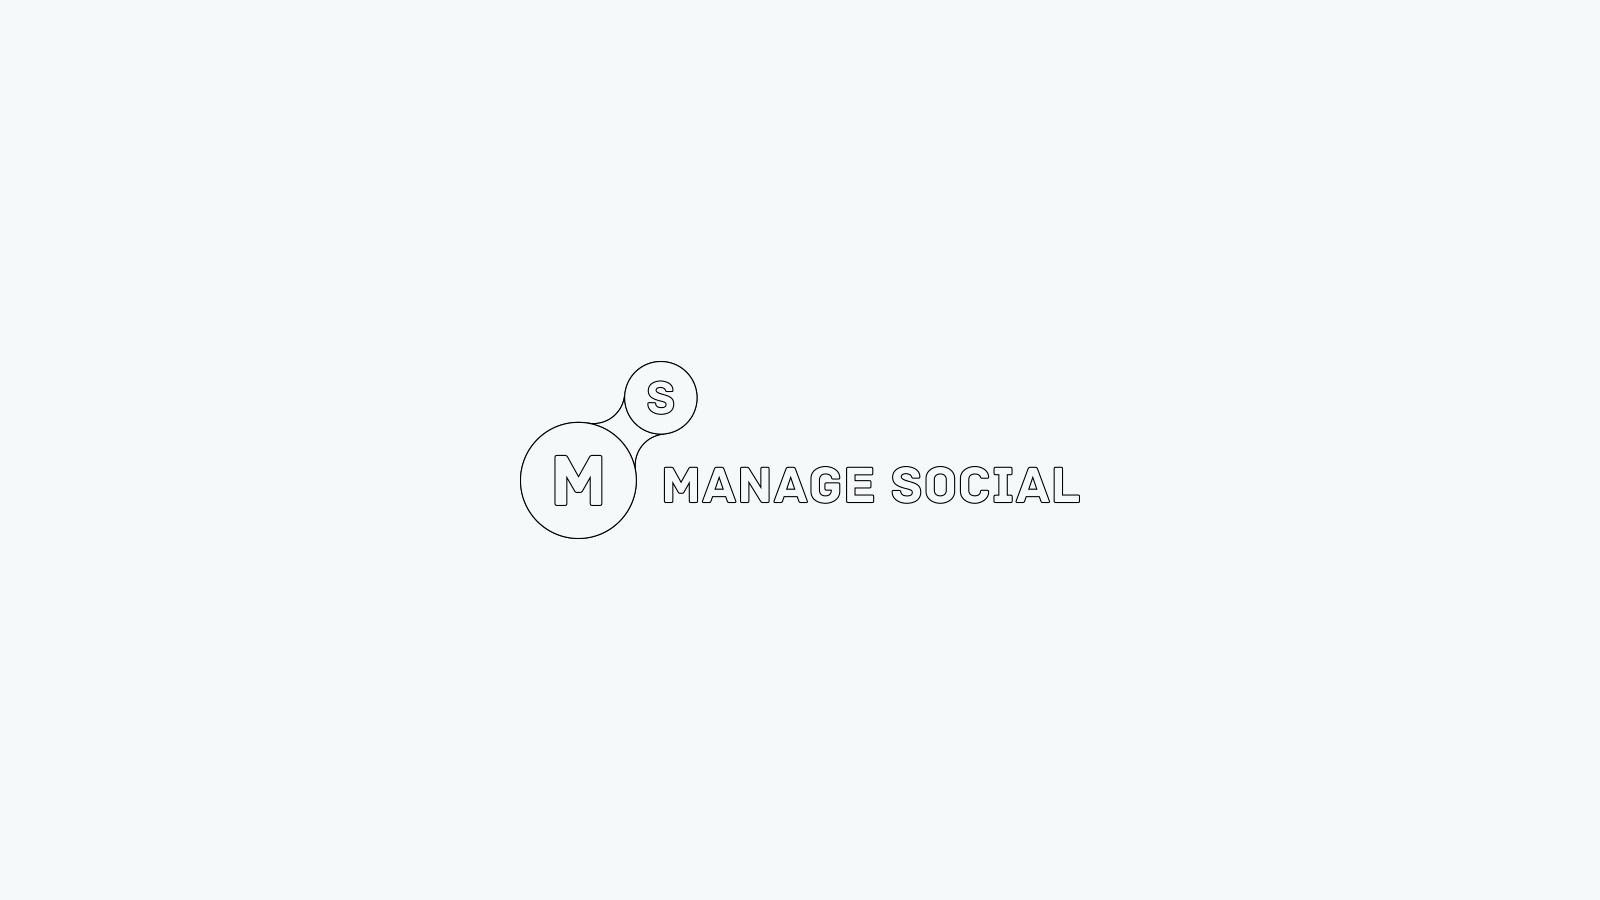 Manage Social 2.jpg